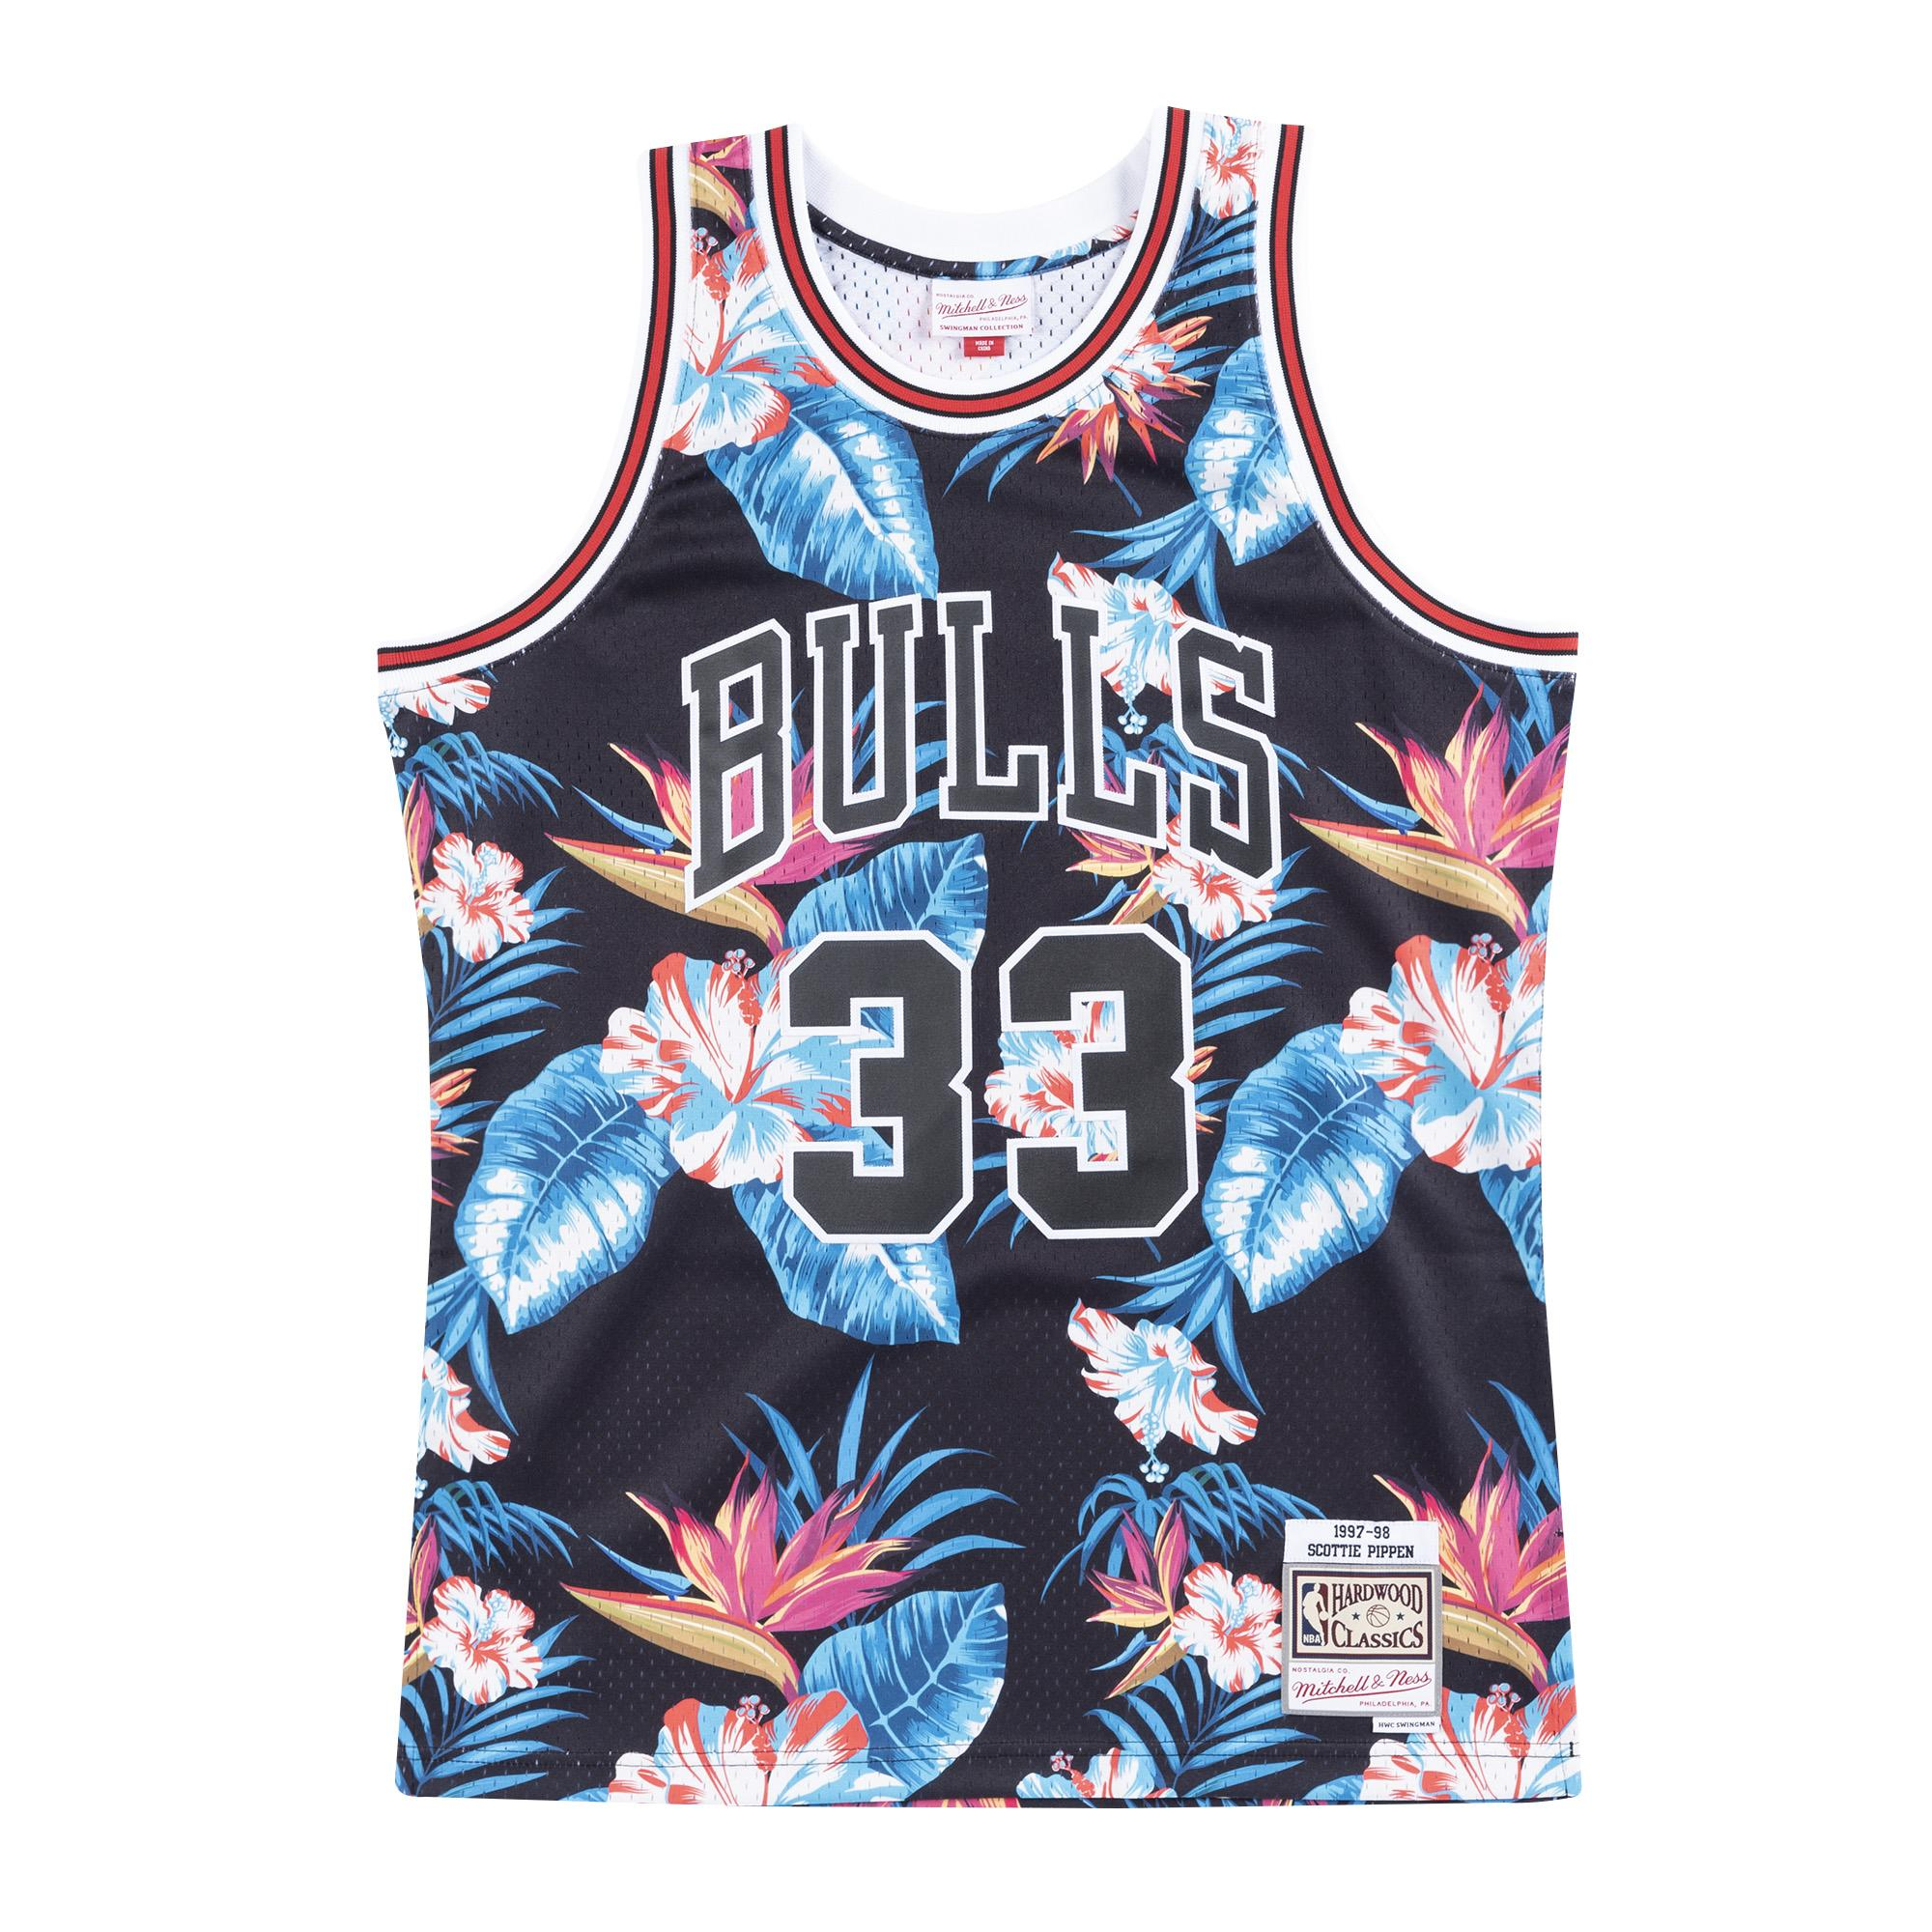 reputable site 109e6 7e5e2 Mitchell & Ness | Chicago Bulls Floral Black Swingman Jersey ...